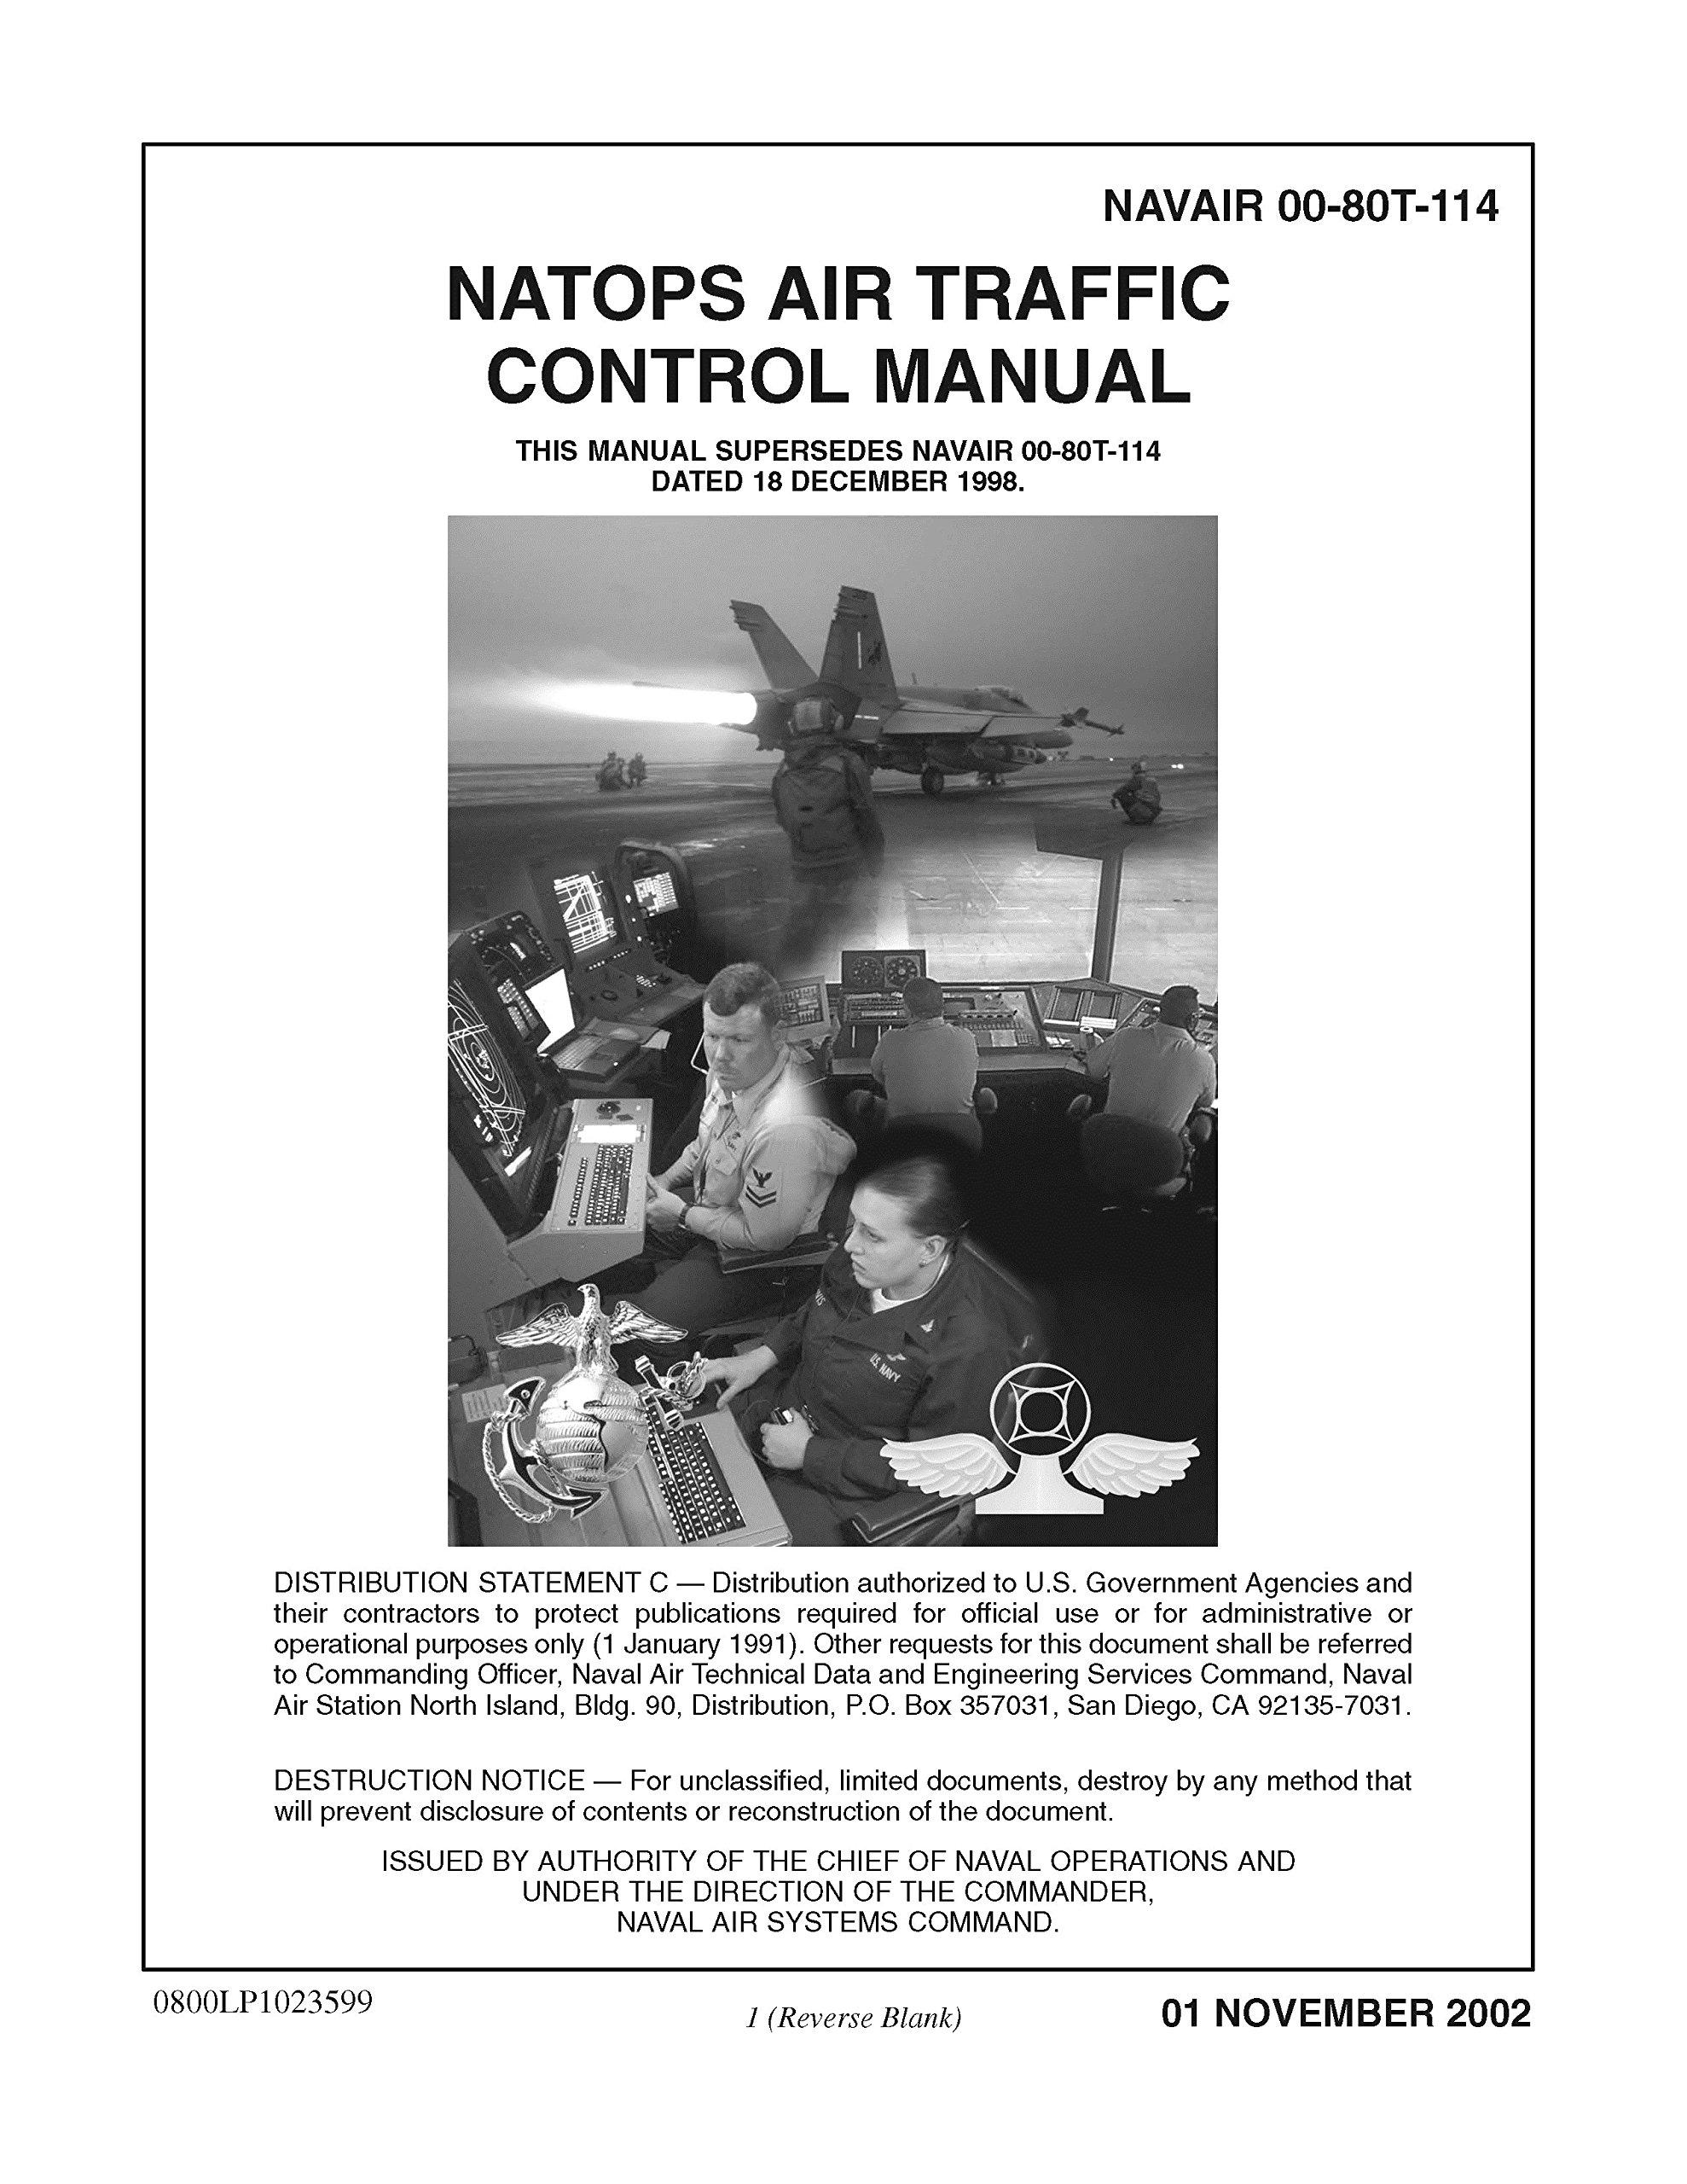 NAVAIR 00 80T 114 NATOPS AIR TRAFFIC CONTROL MANUAL Loose Leaf